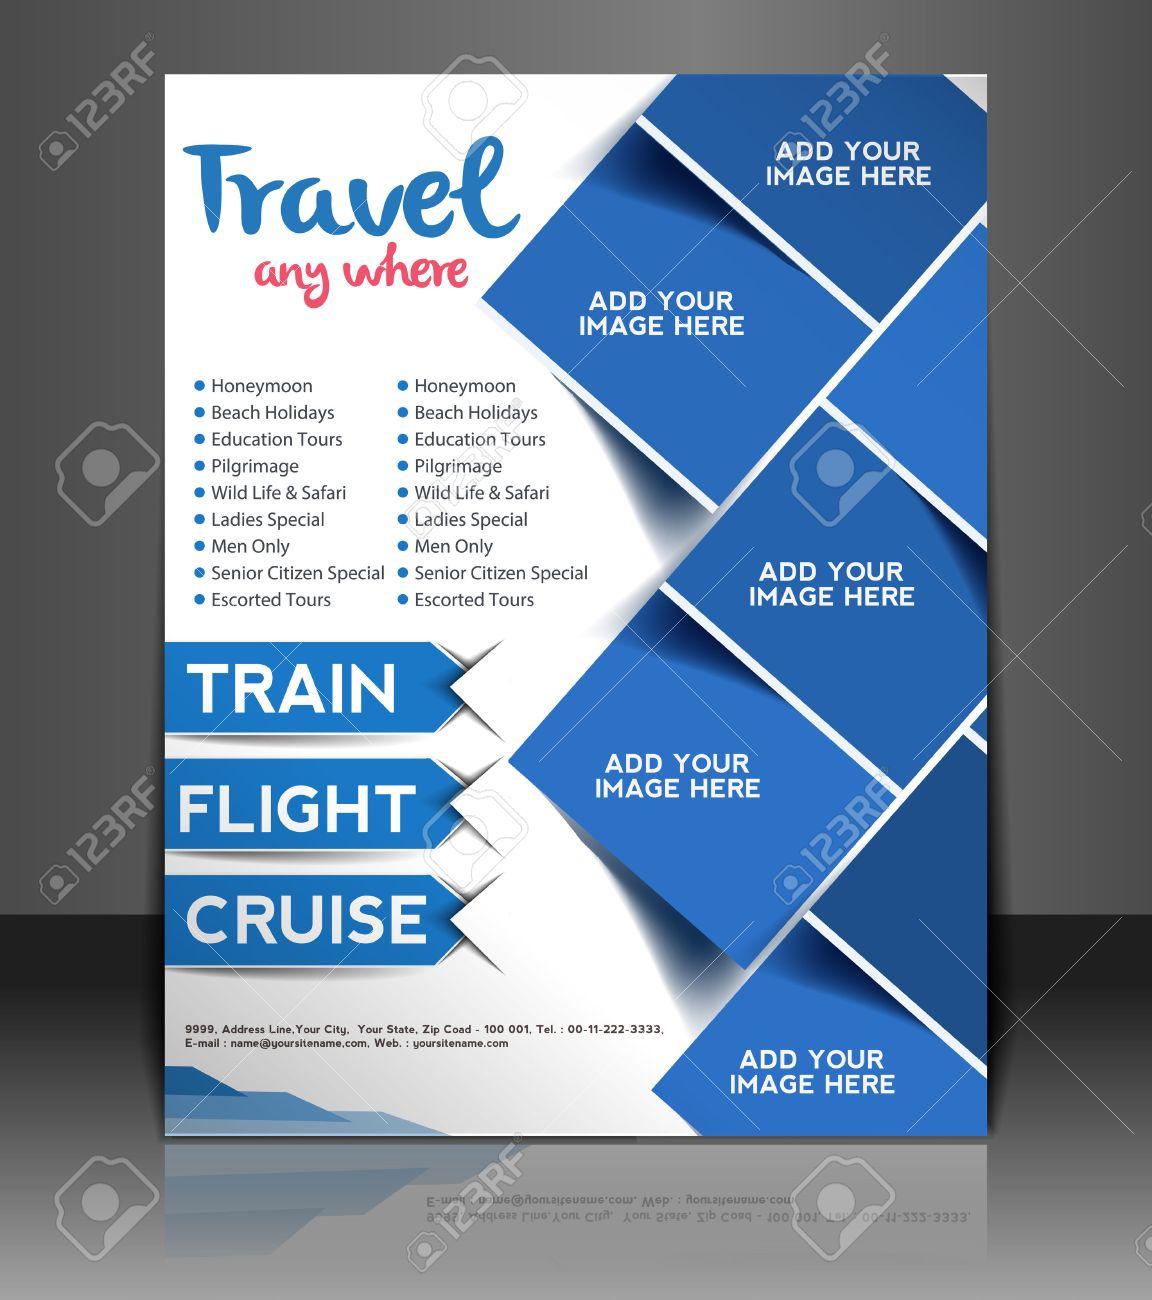 Travel Center Flyer Poster Template Design